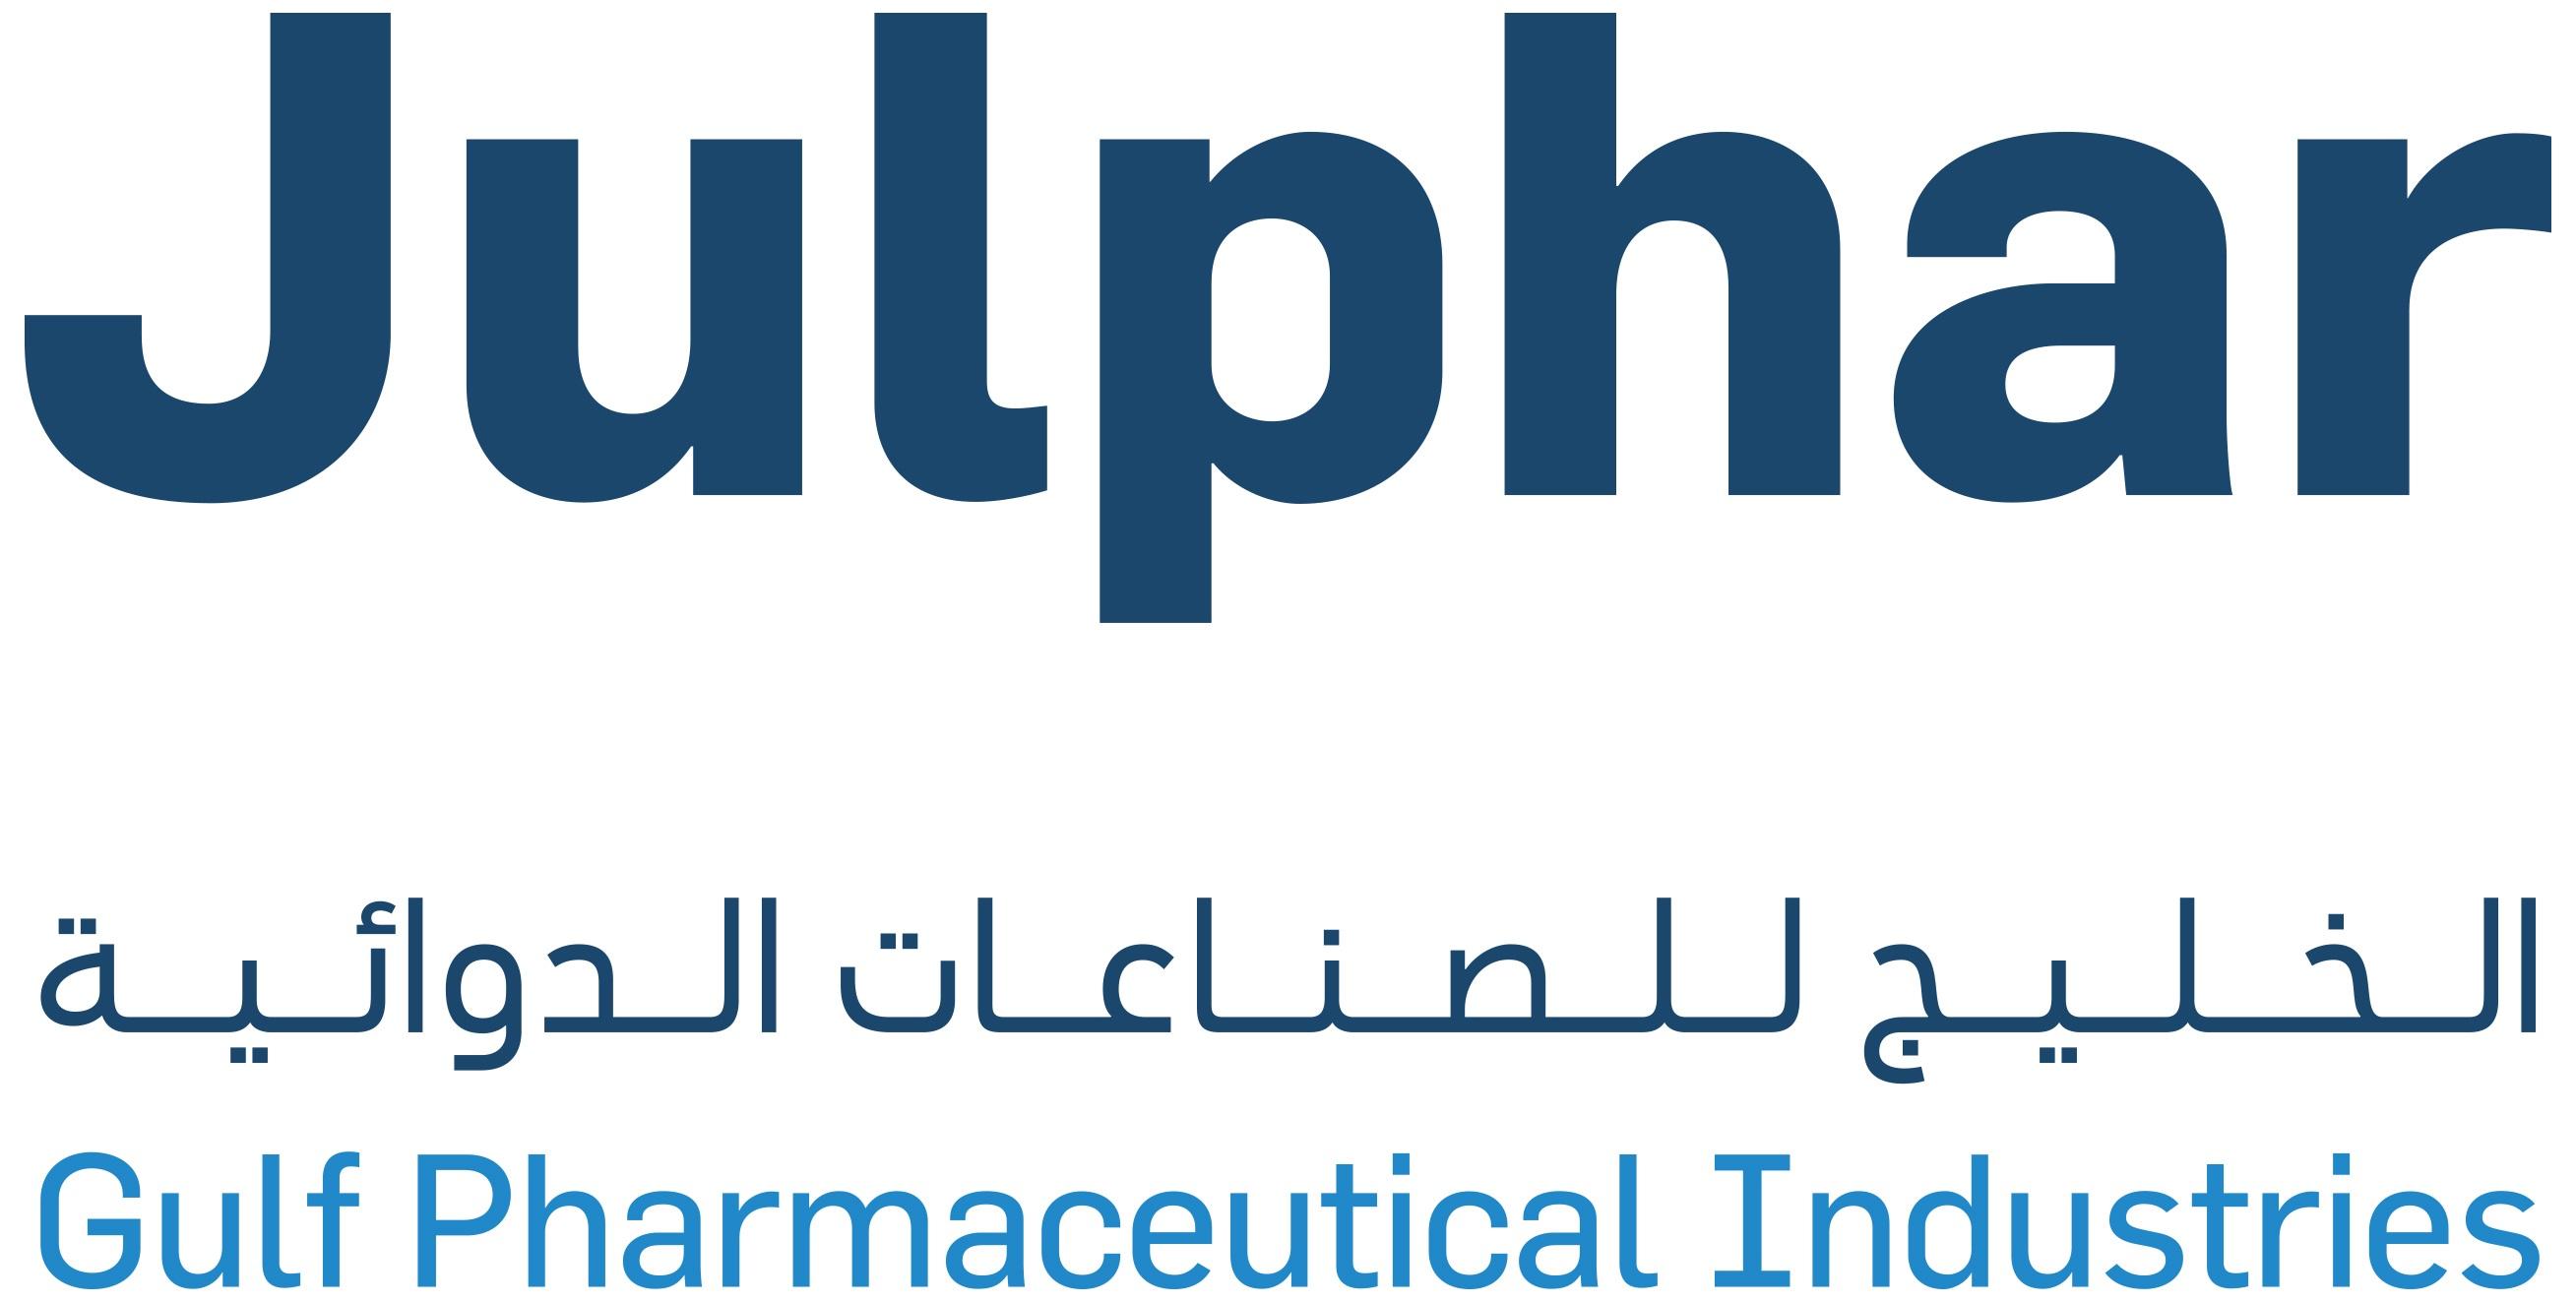 Julphar Gulf Pharmaceutical Industries Manufacturers